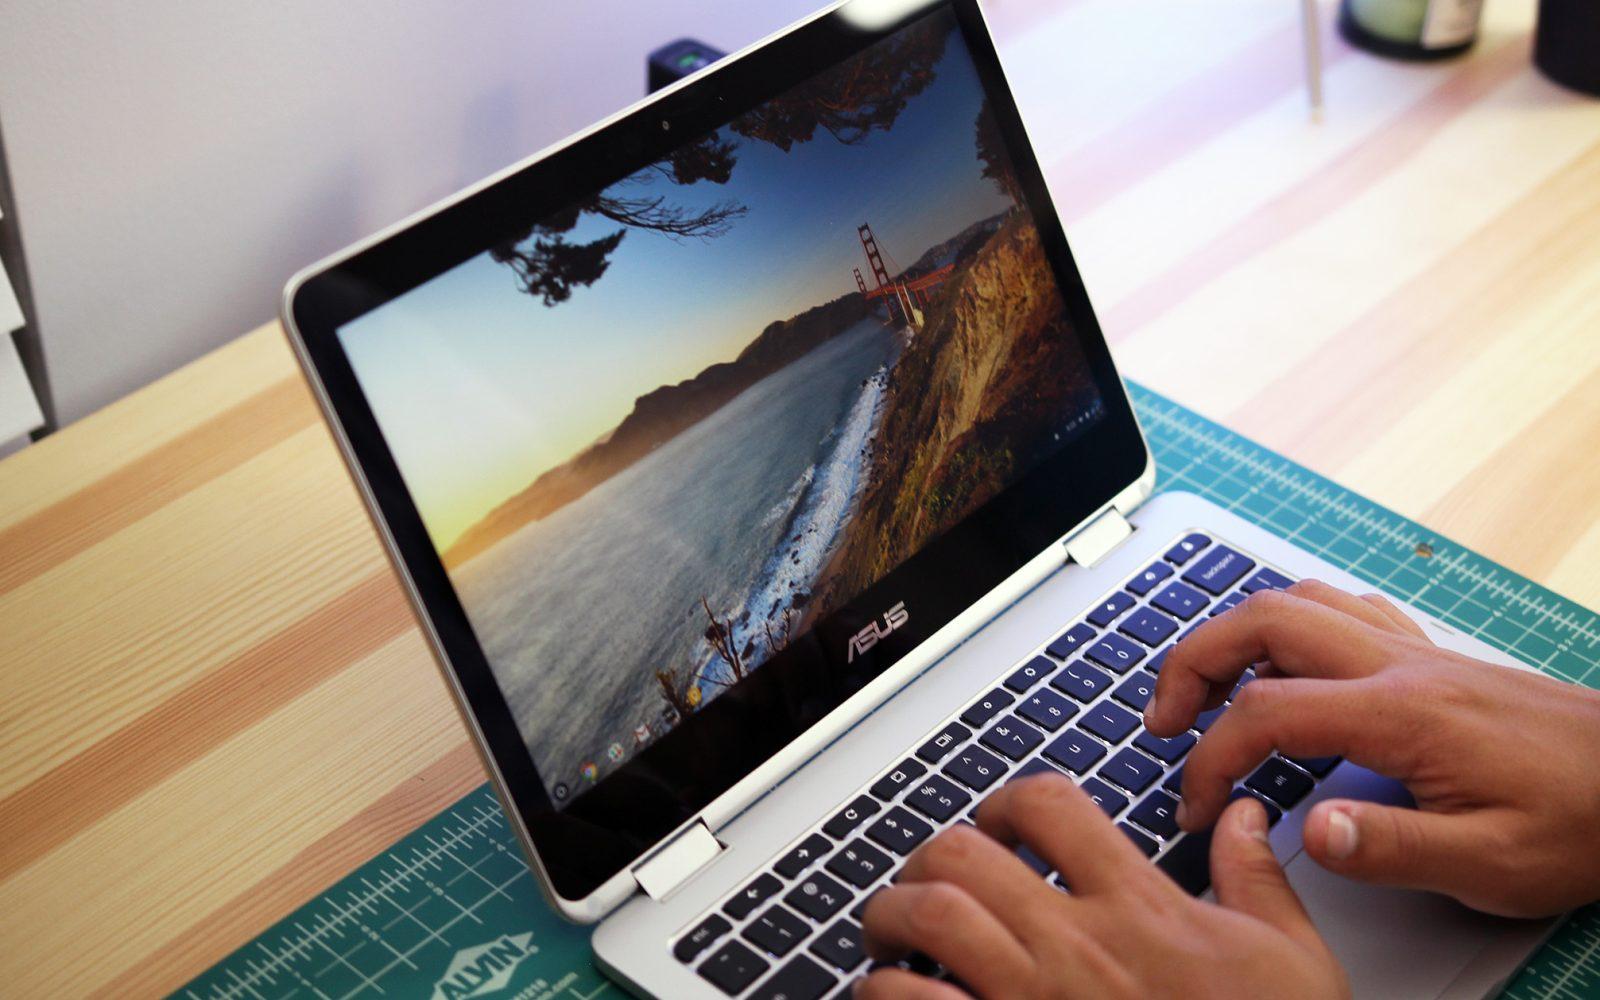 ASUS' UK store surfaces the evasive Chromebook Flip C302CA